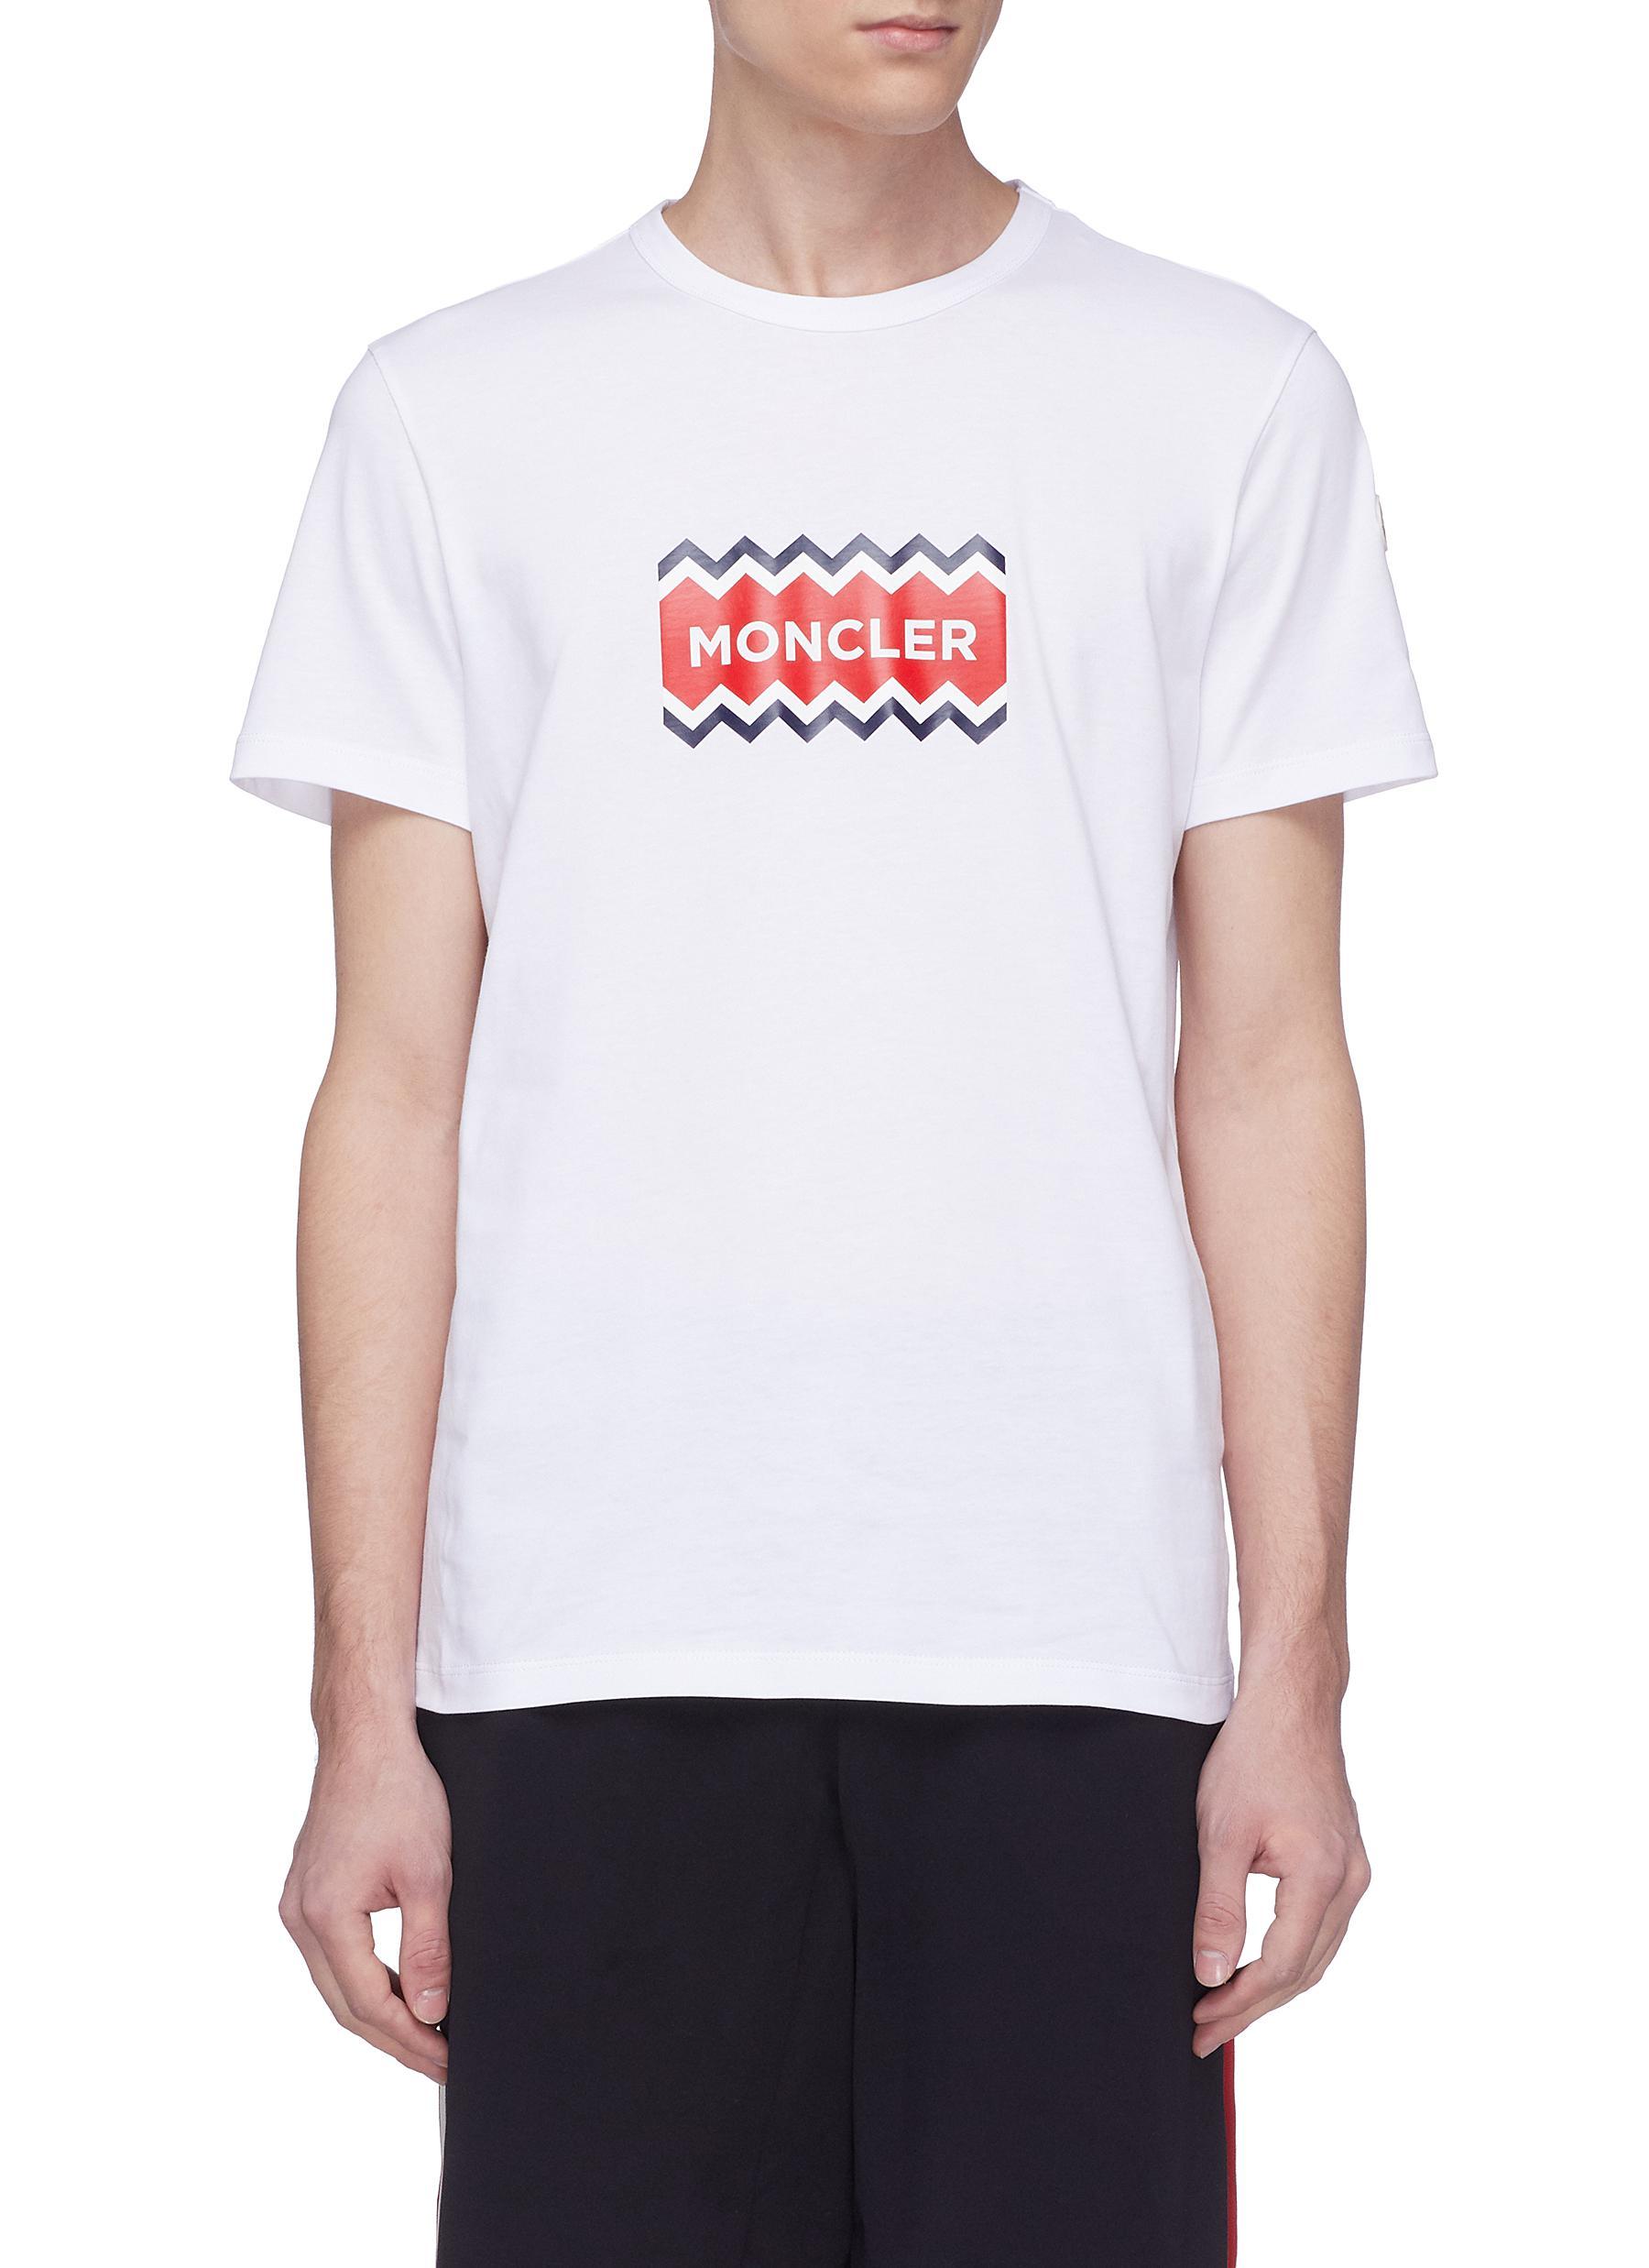 d545aef24 Main View - Click To Enlarge - MONCLER - Logo print T-shirt